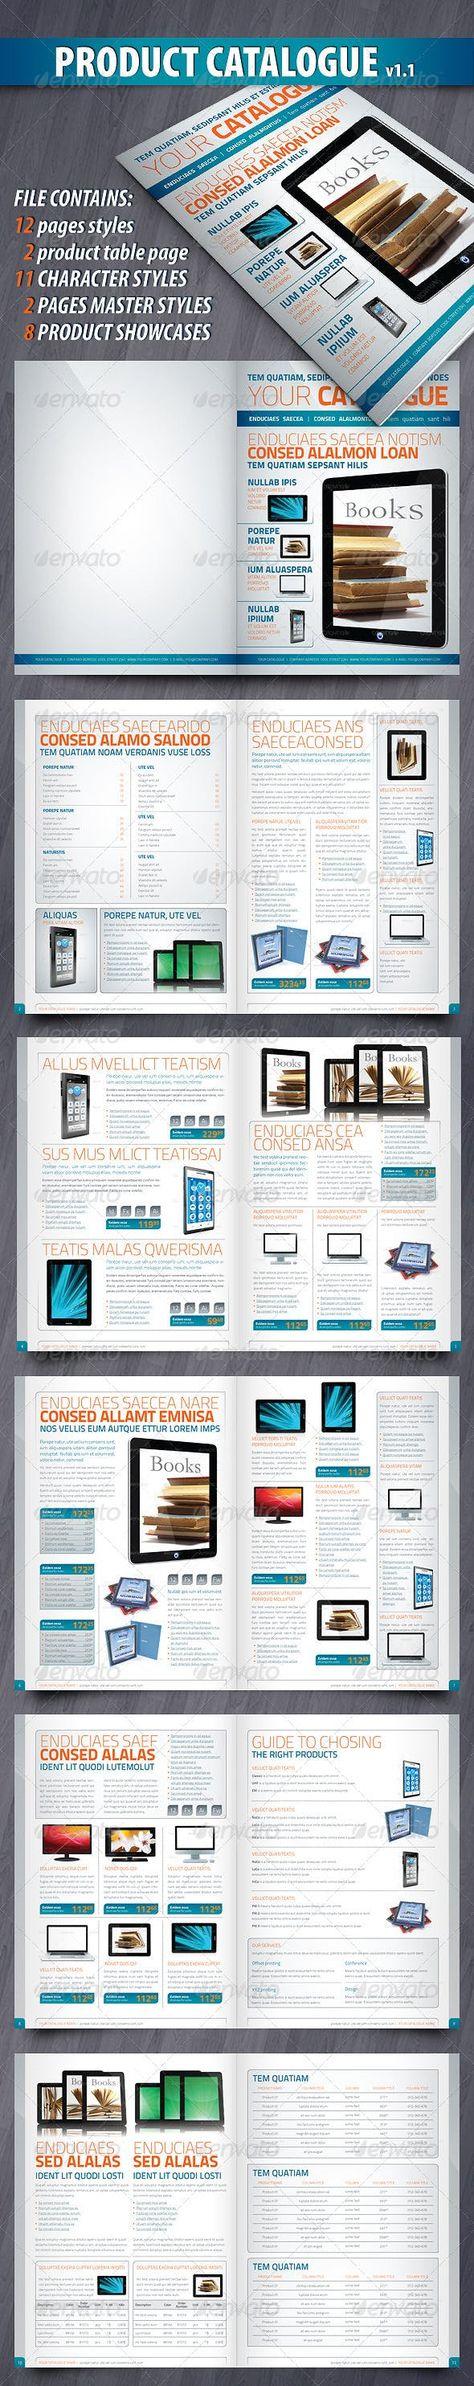 Product Catalog/Brochure